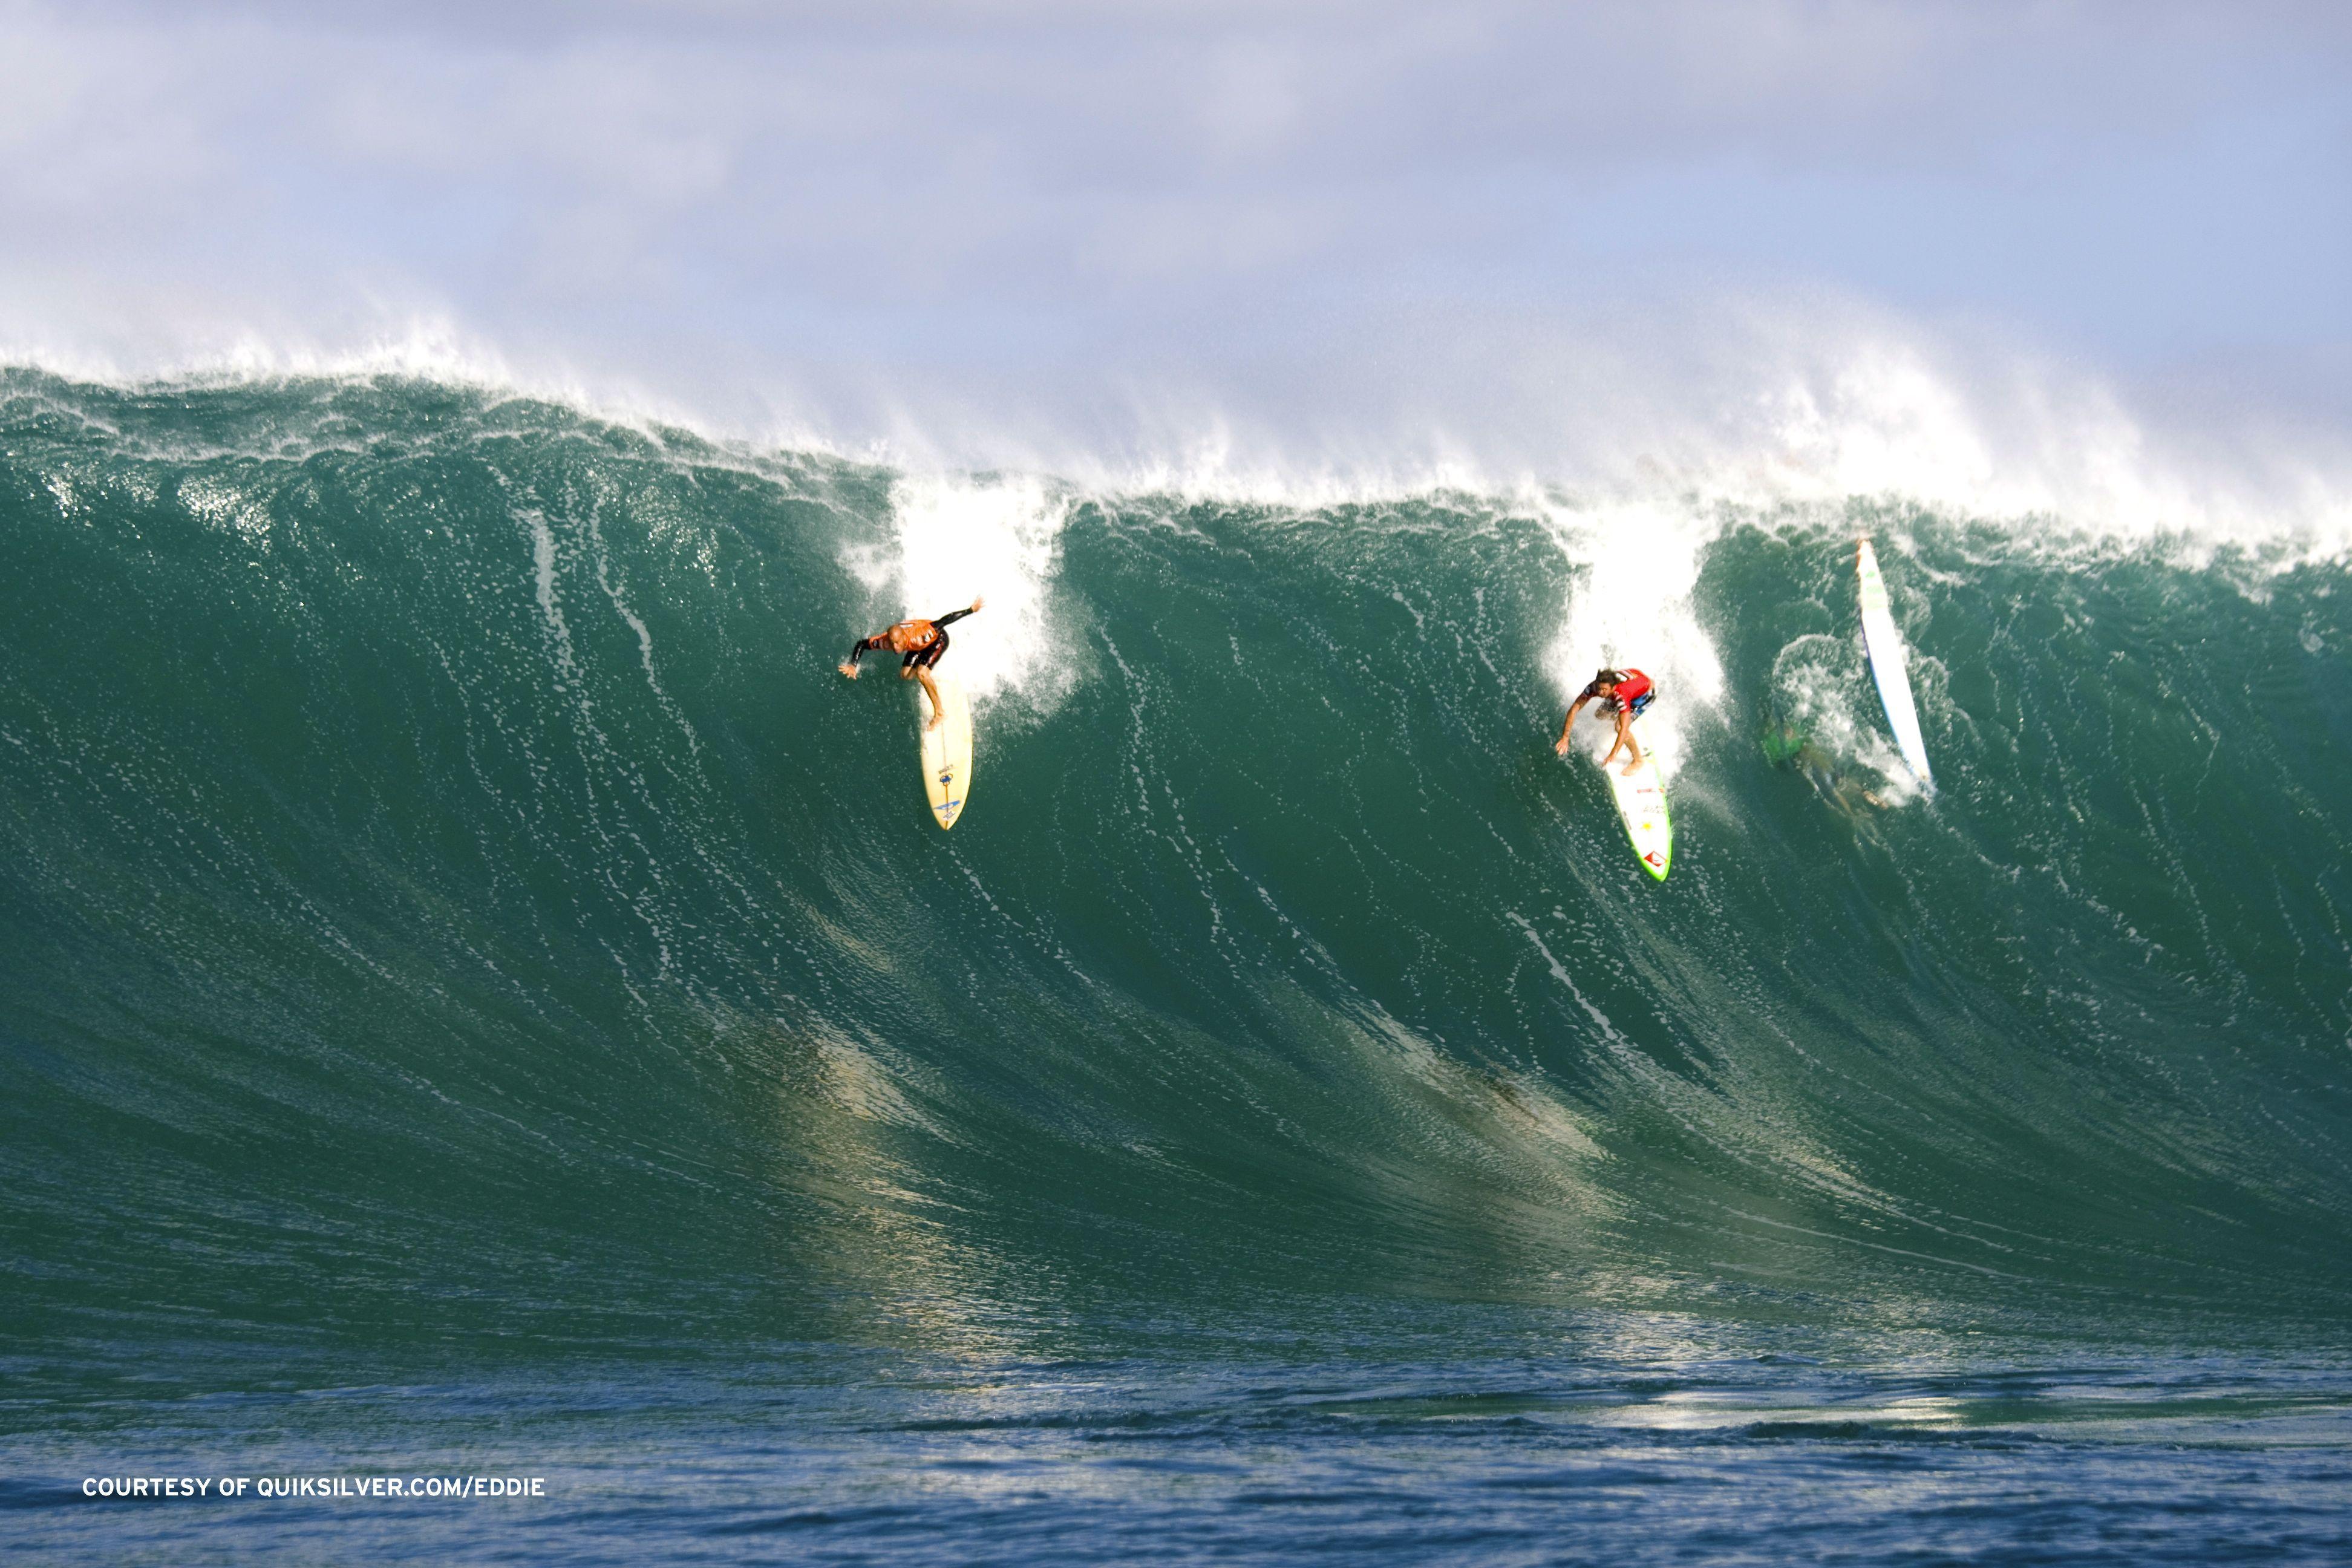 Kelly Slater & Reef McIntosh were both charging hard at Waimea the